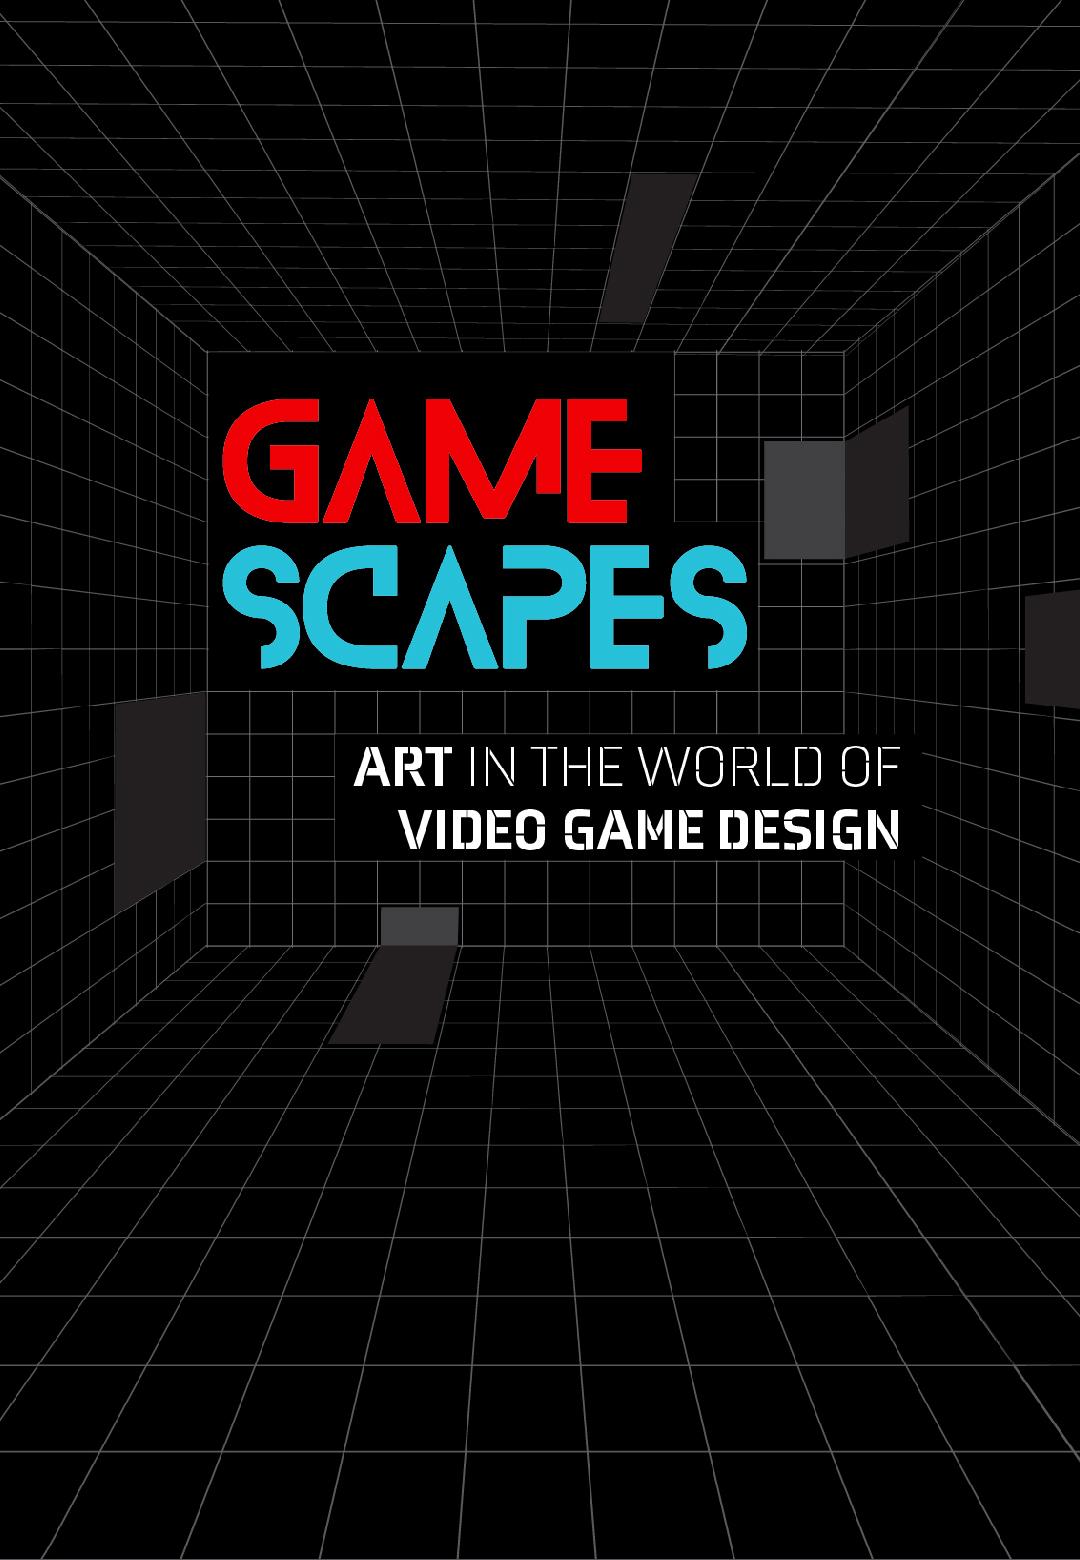 STIR examines video games as an art form | Video games as an art form | STIRworld